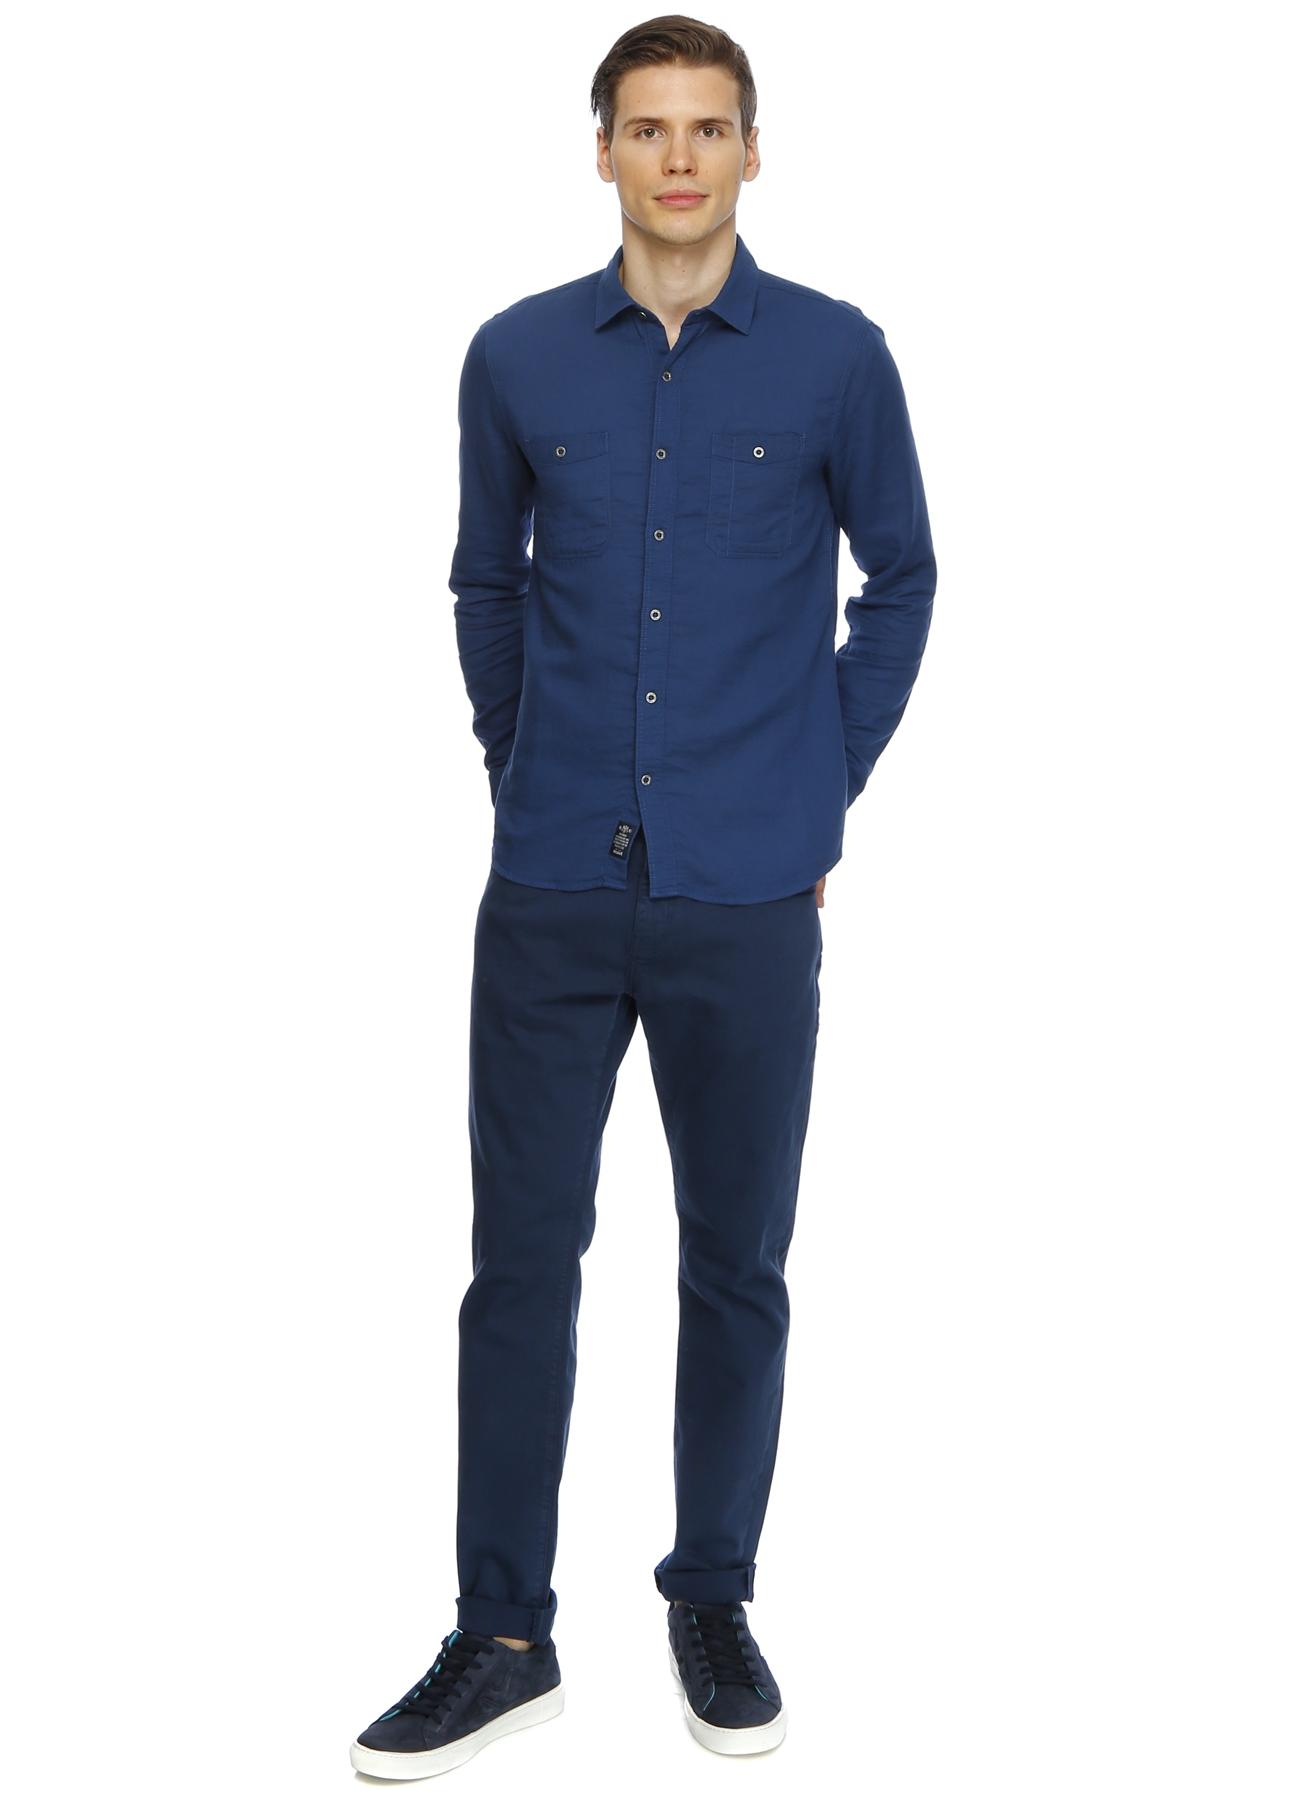 Mavi Jake Lacivert Klasik Pantolon 31-28 5001817697028 Ürün Resmi